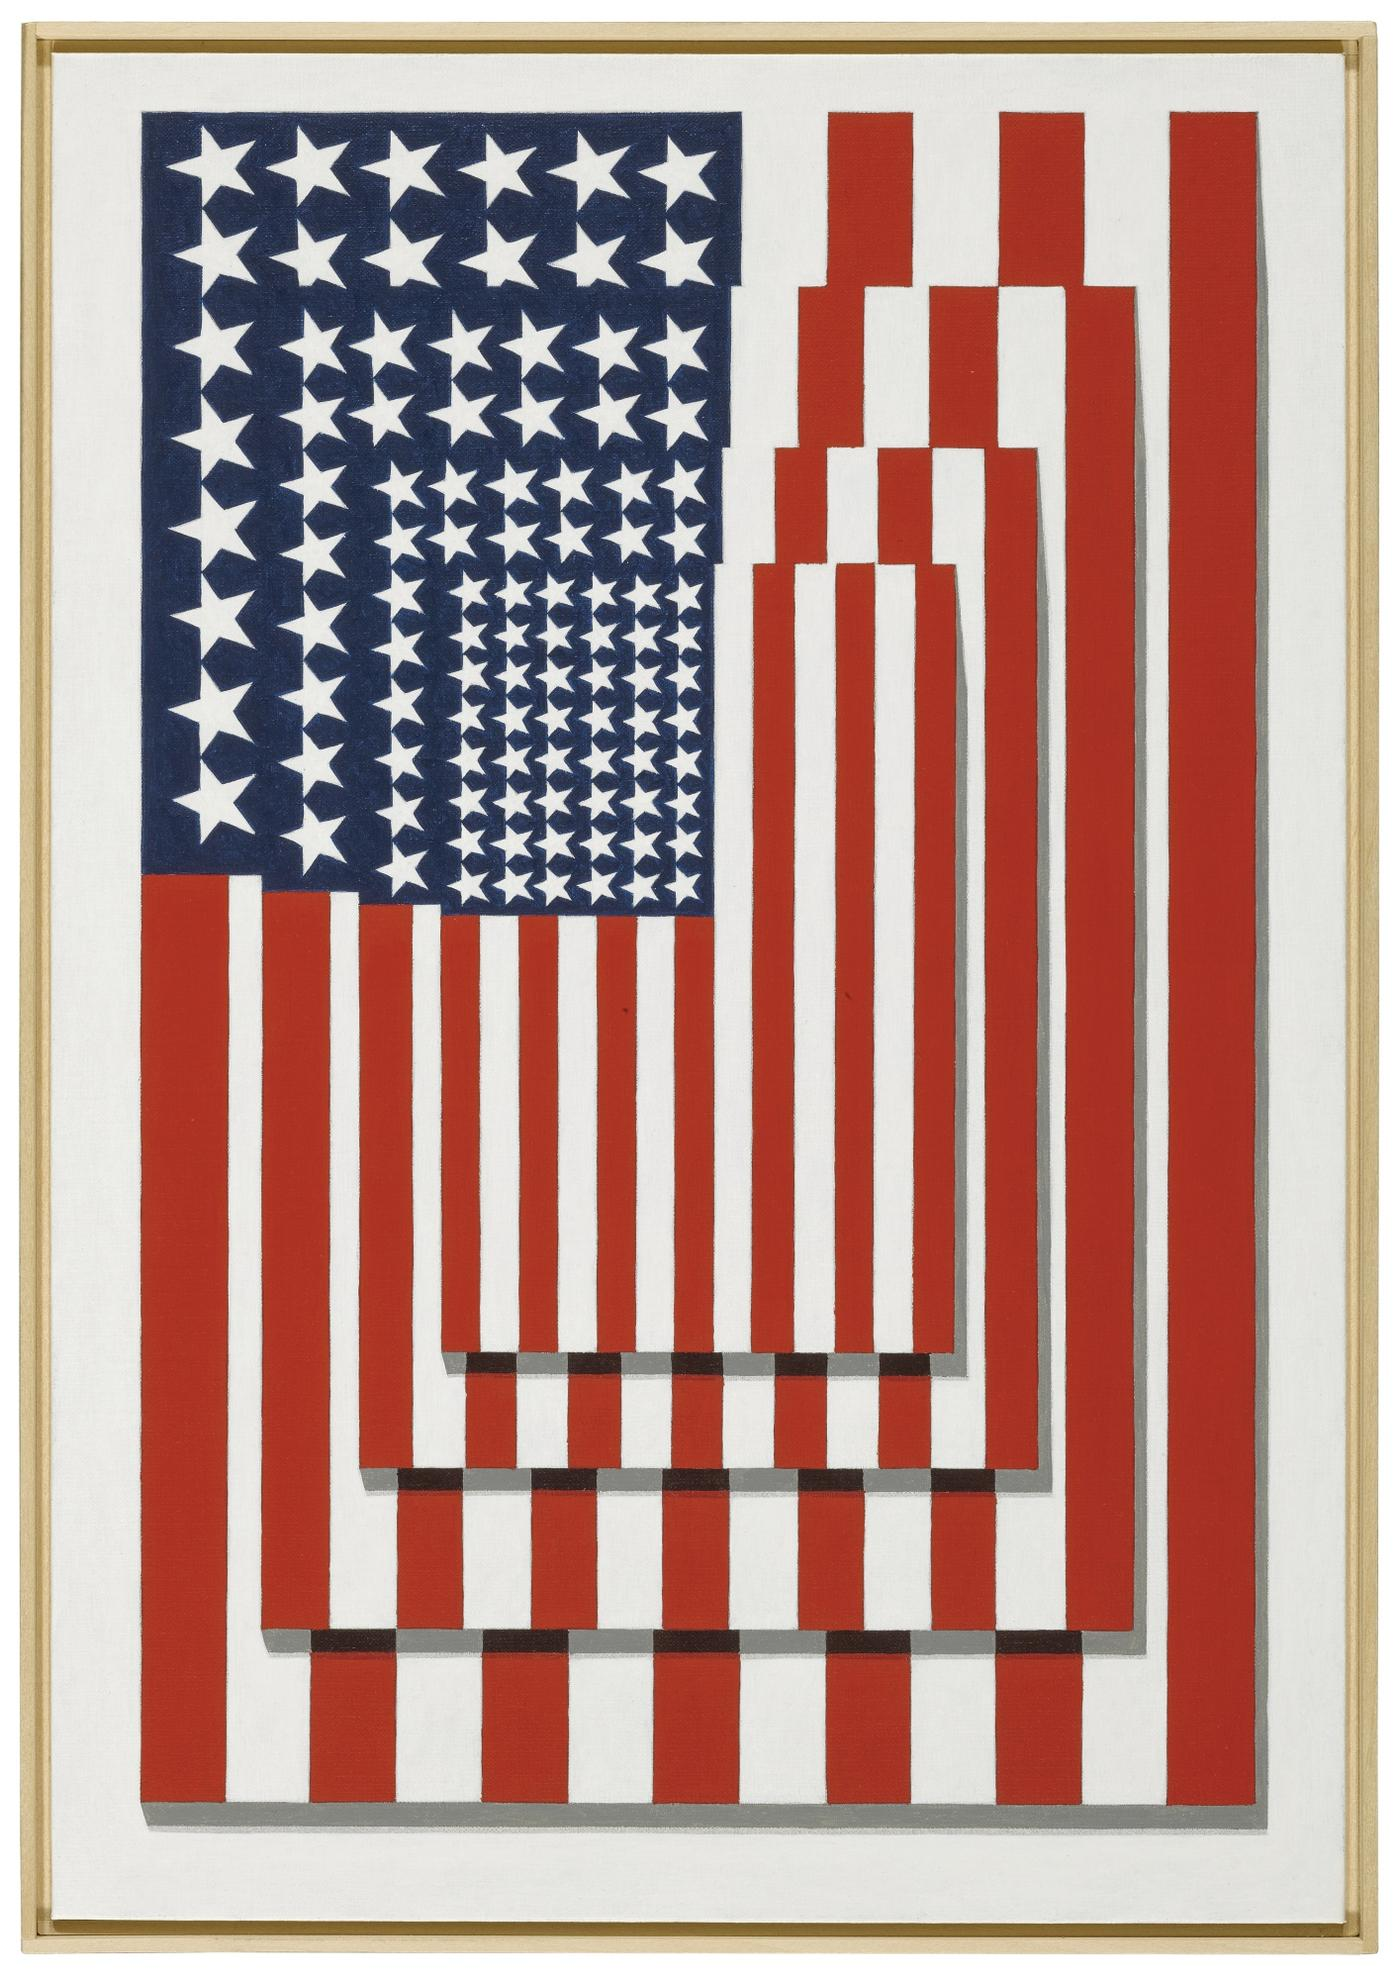 Richard Pettibone-Four Flags, Vertical, #2-2002